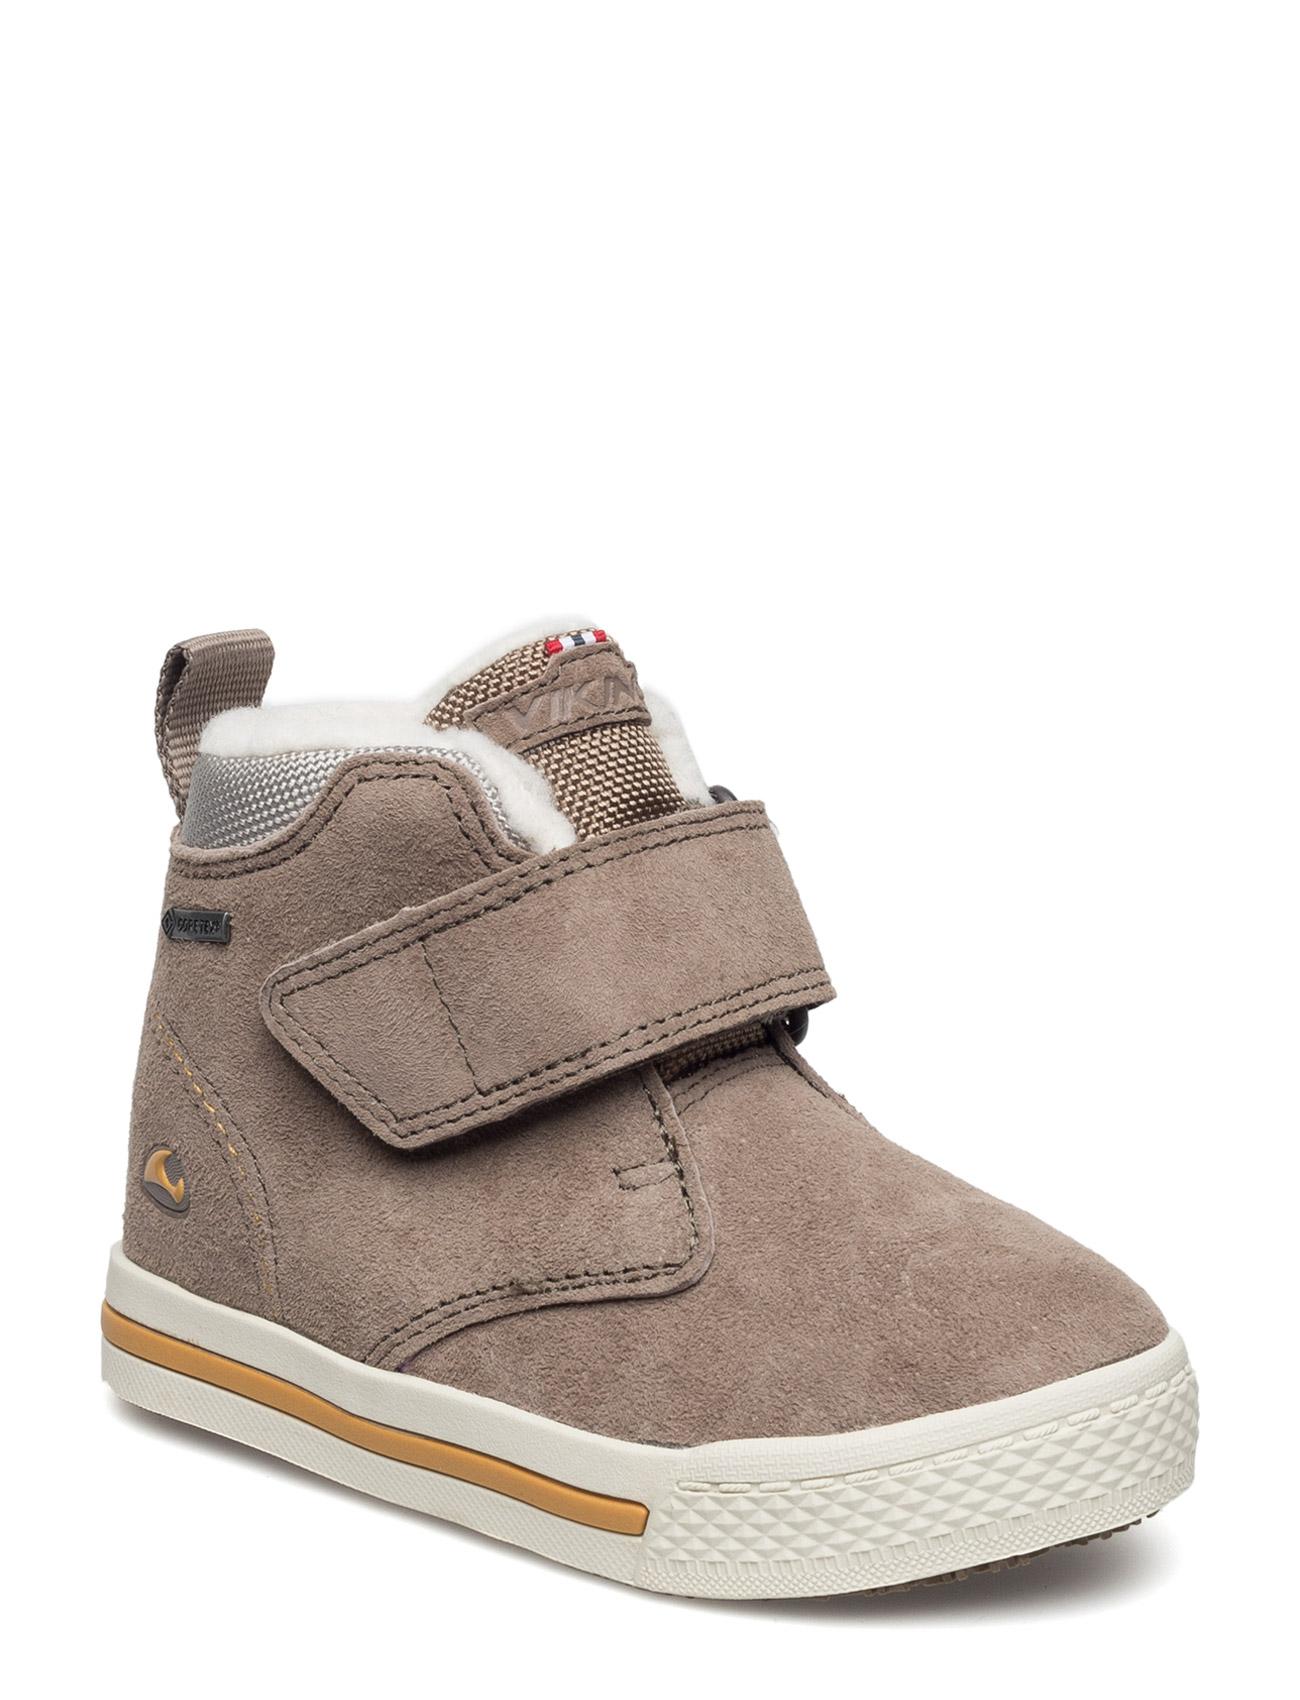 Lovvund Warm Gtx Viking Sko & Sneakers til Børn i Taupe